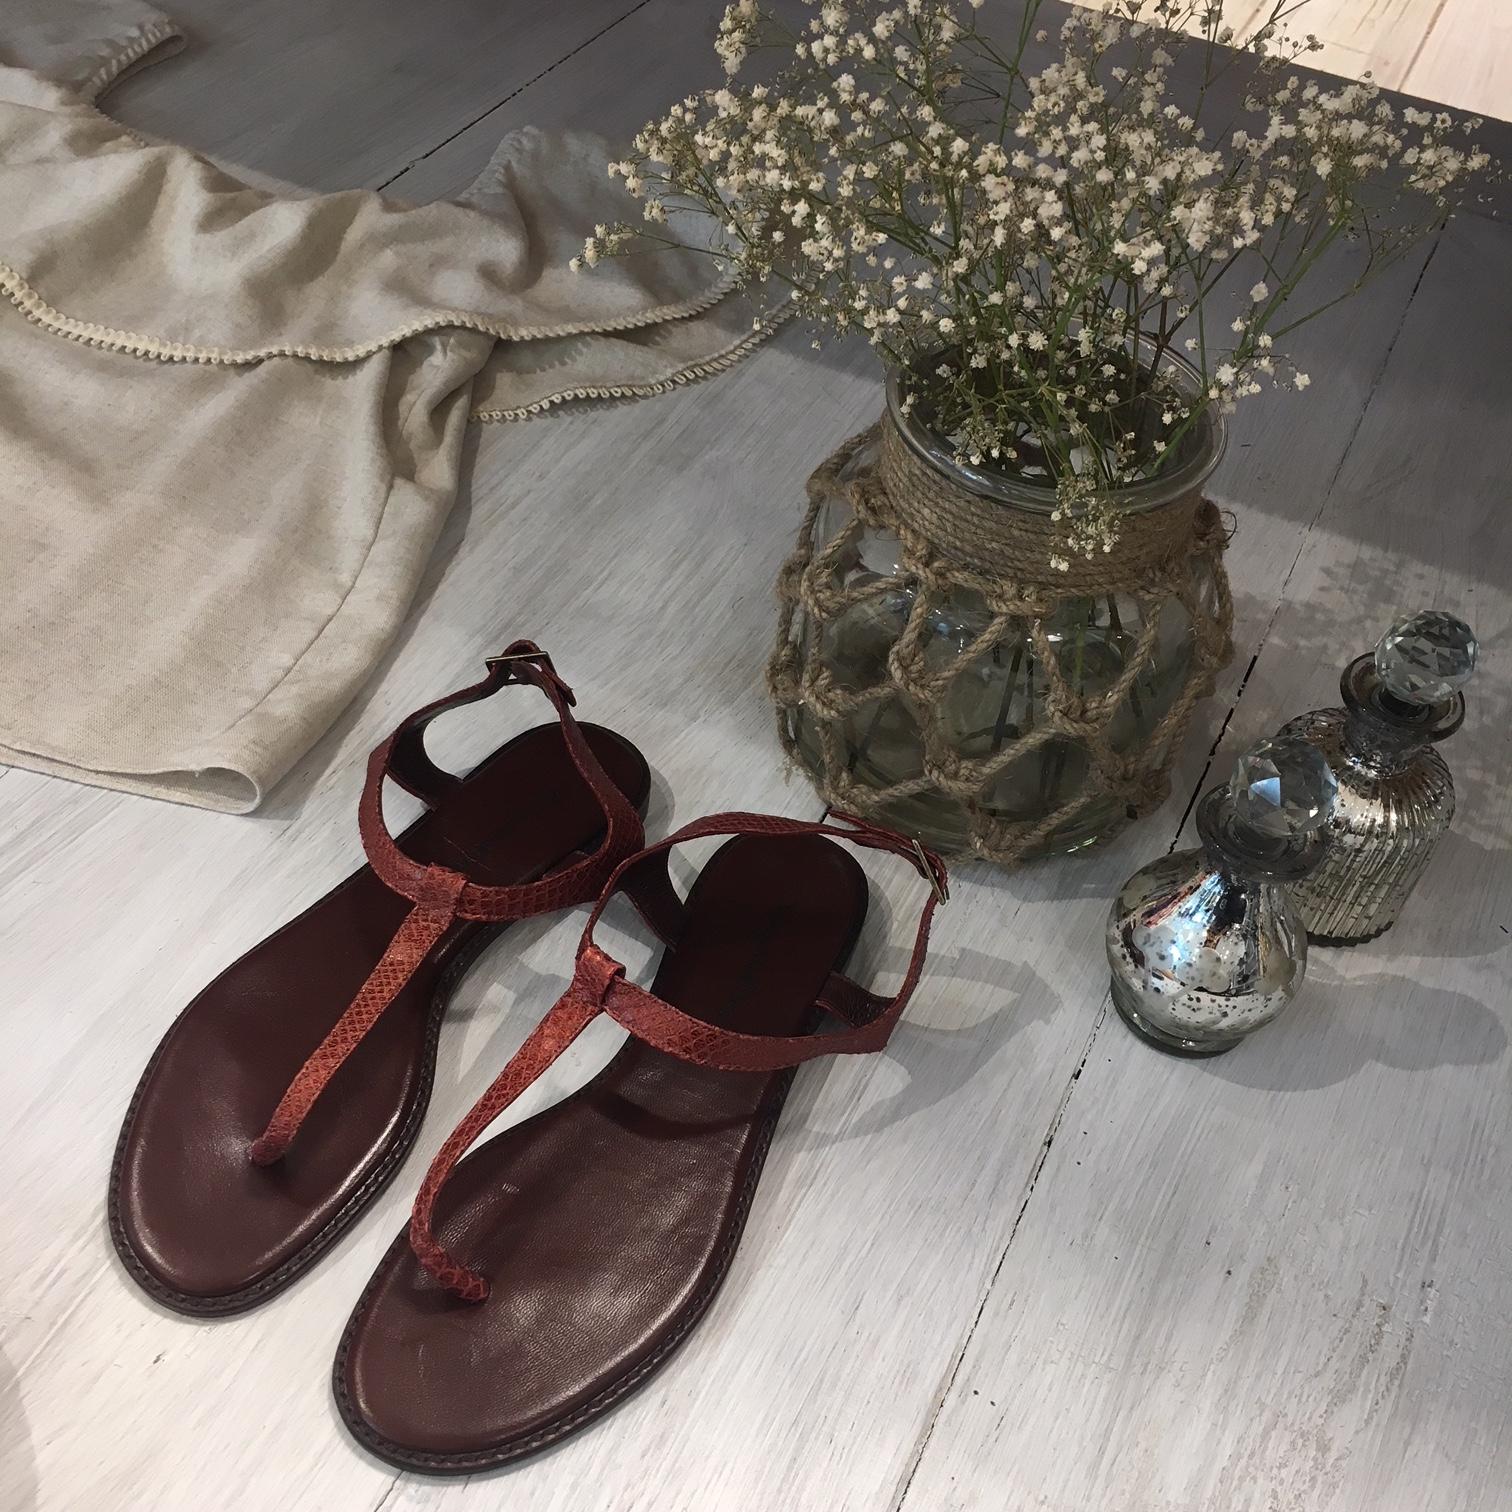 tfs-dez-sandalia-marrom